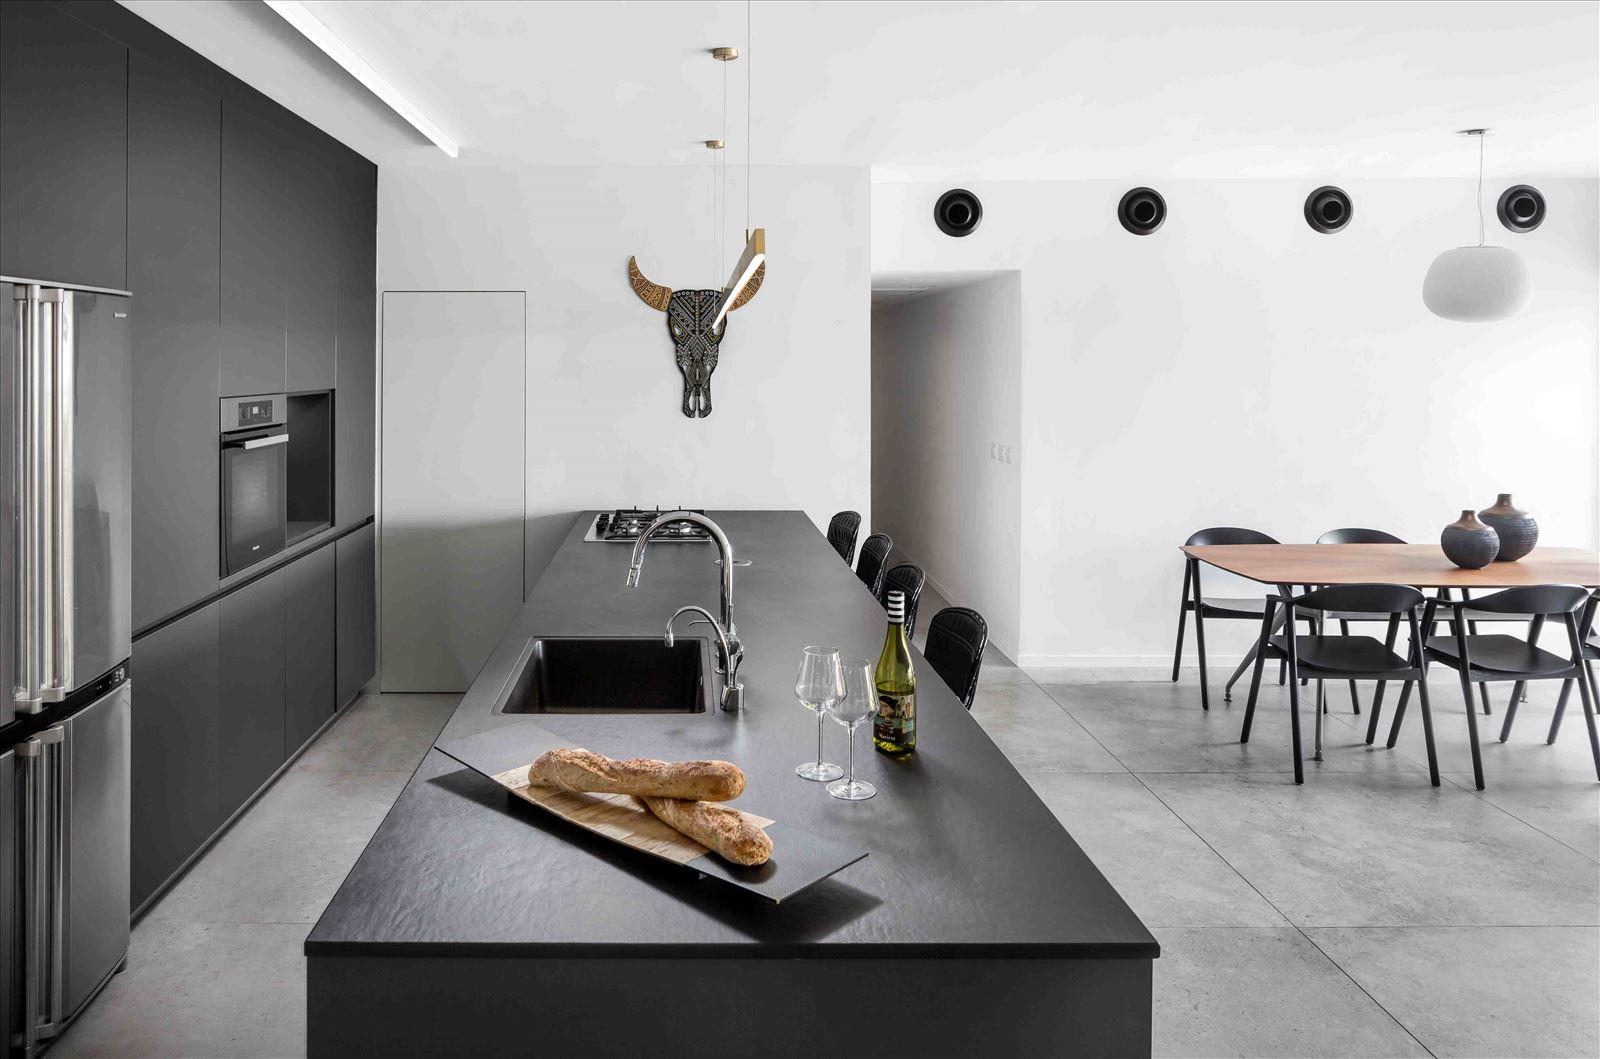 Apartment in North Tel Aviv פרויקט תאורה במטבח מבית דורי קמחי